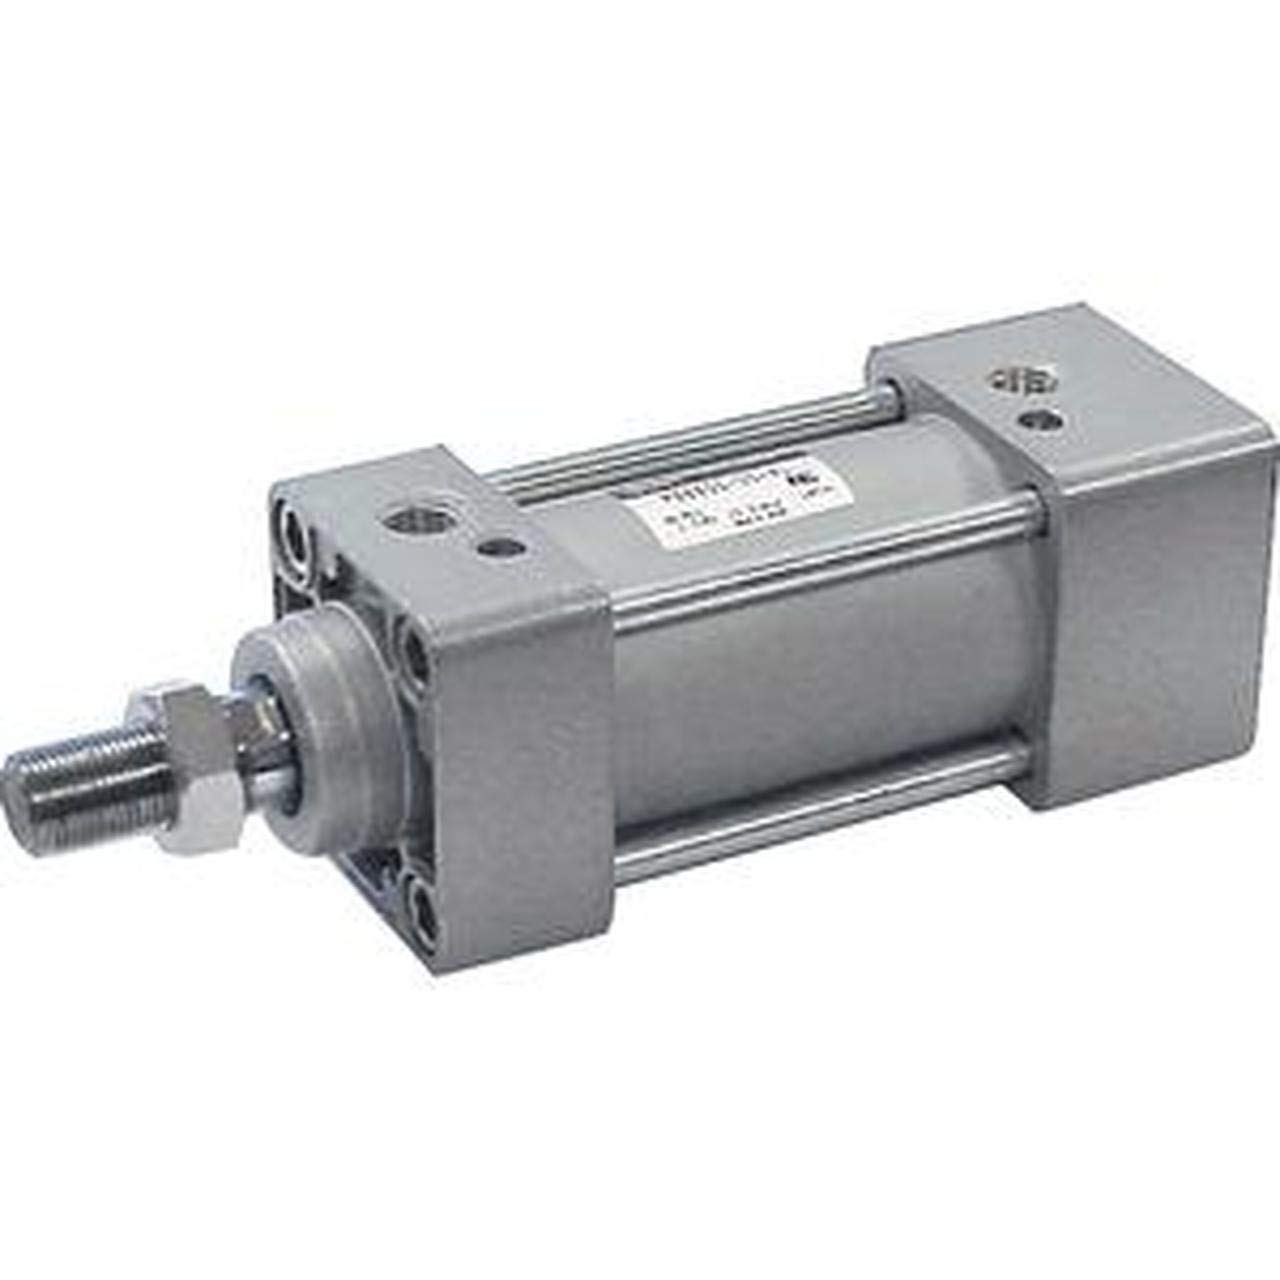 Pack of 2 SMC MB2611-01-1 Manifold blk,Non-Plug 1//8